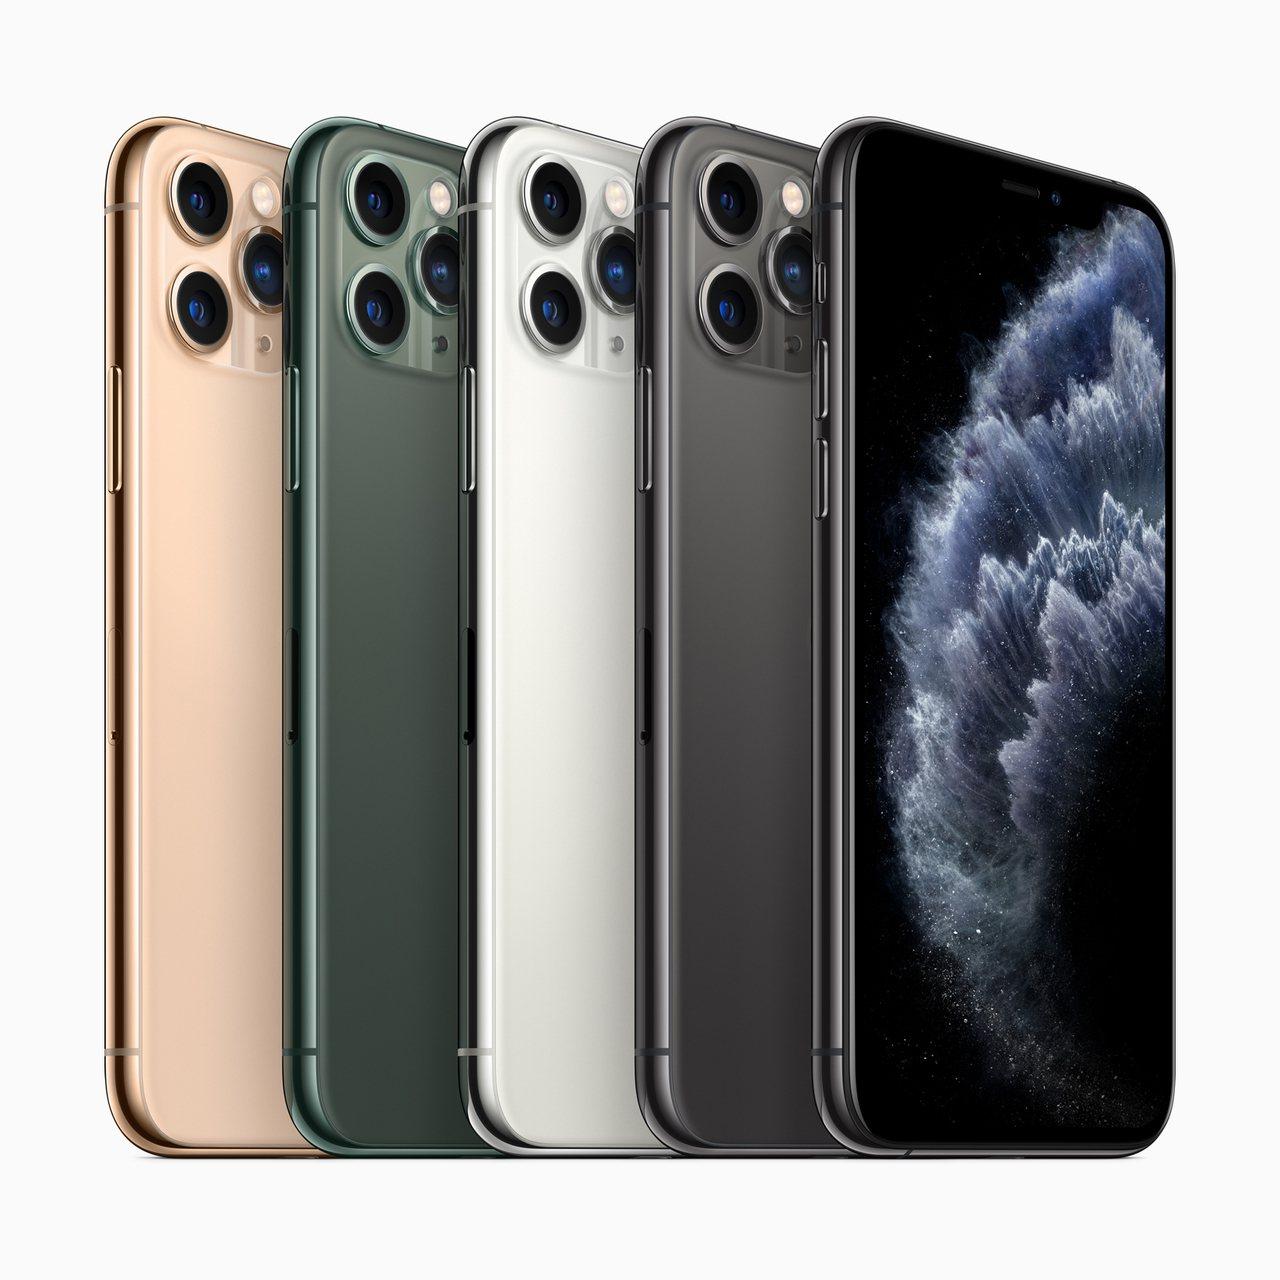 iPhone 11 Pro系列這次共推出金、夜幕綠、白、太空灰4色。圖/蘋果提供